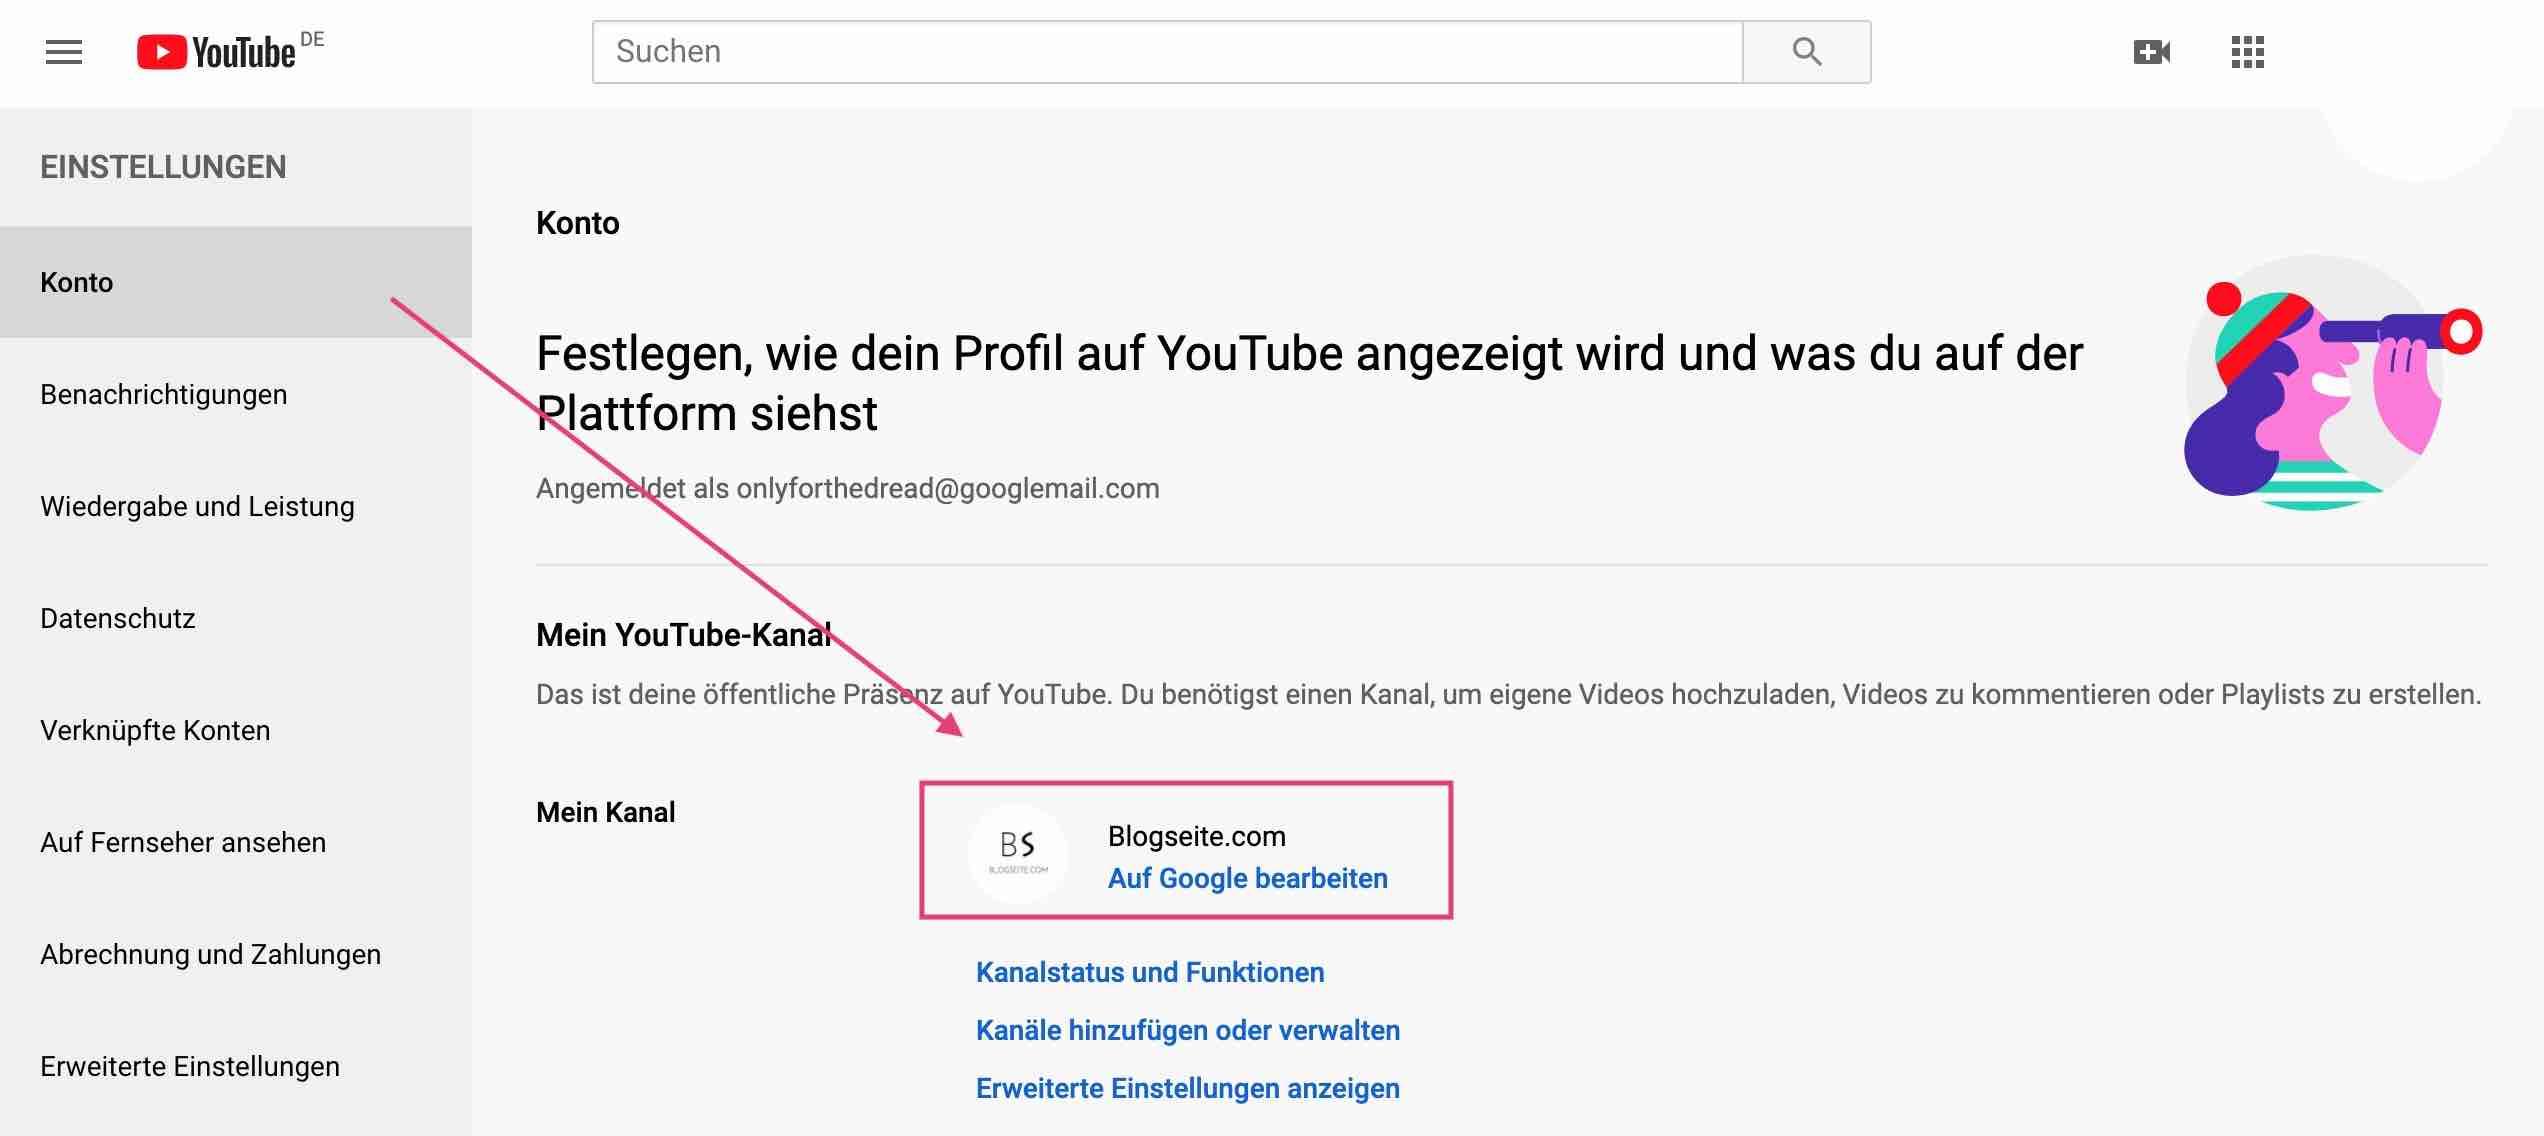 Youtube Kanal Name auf Google ändern